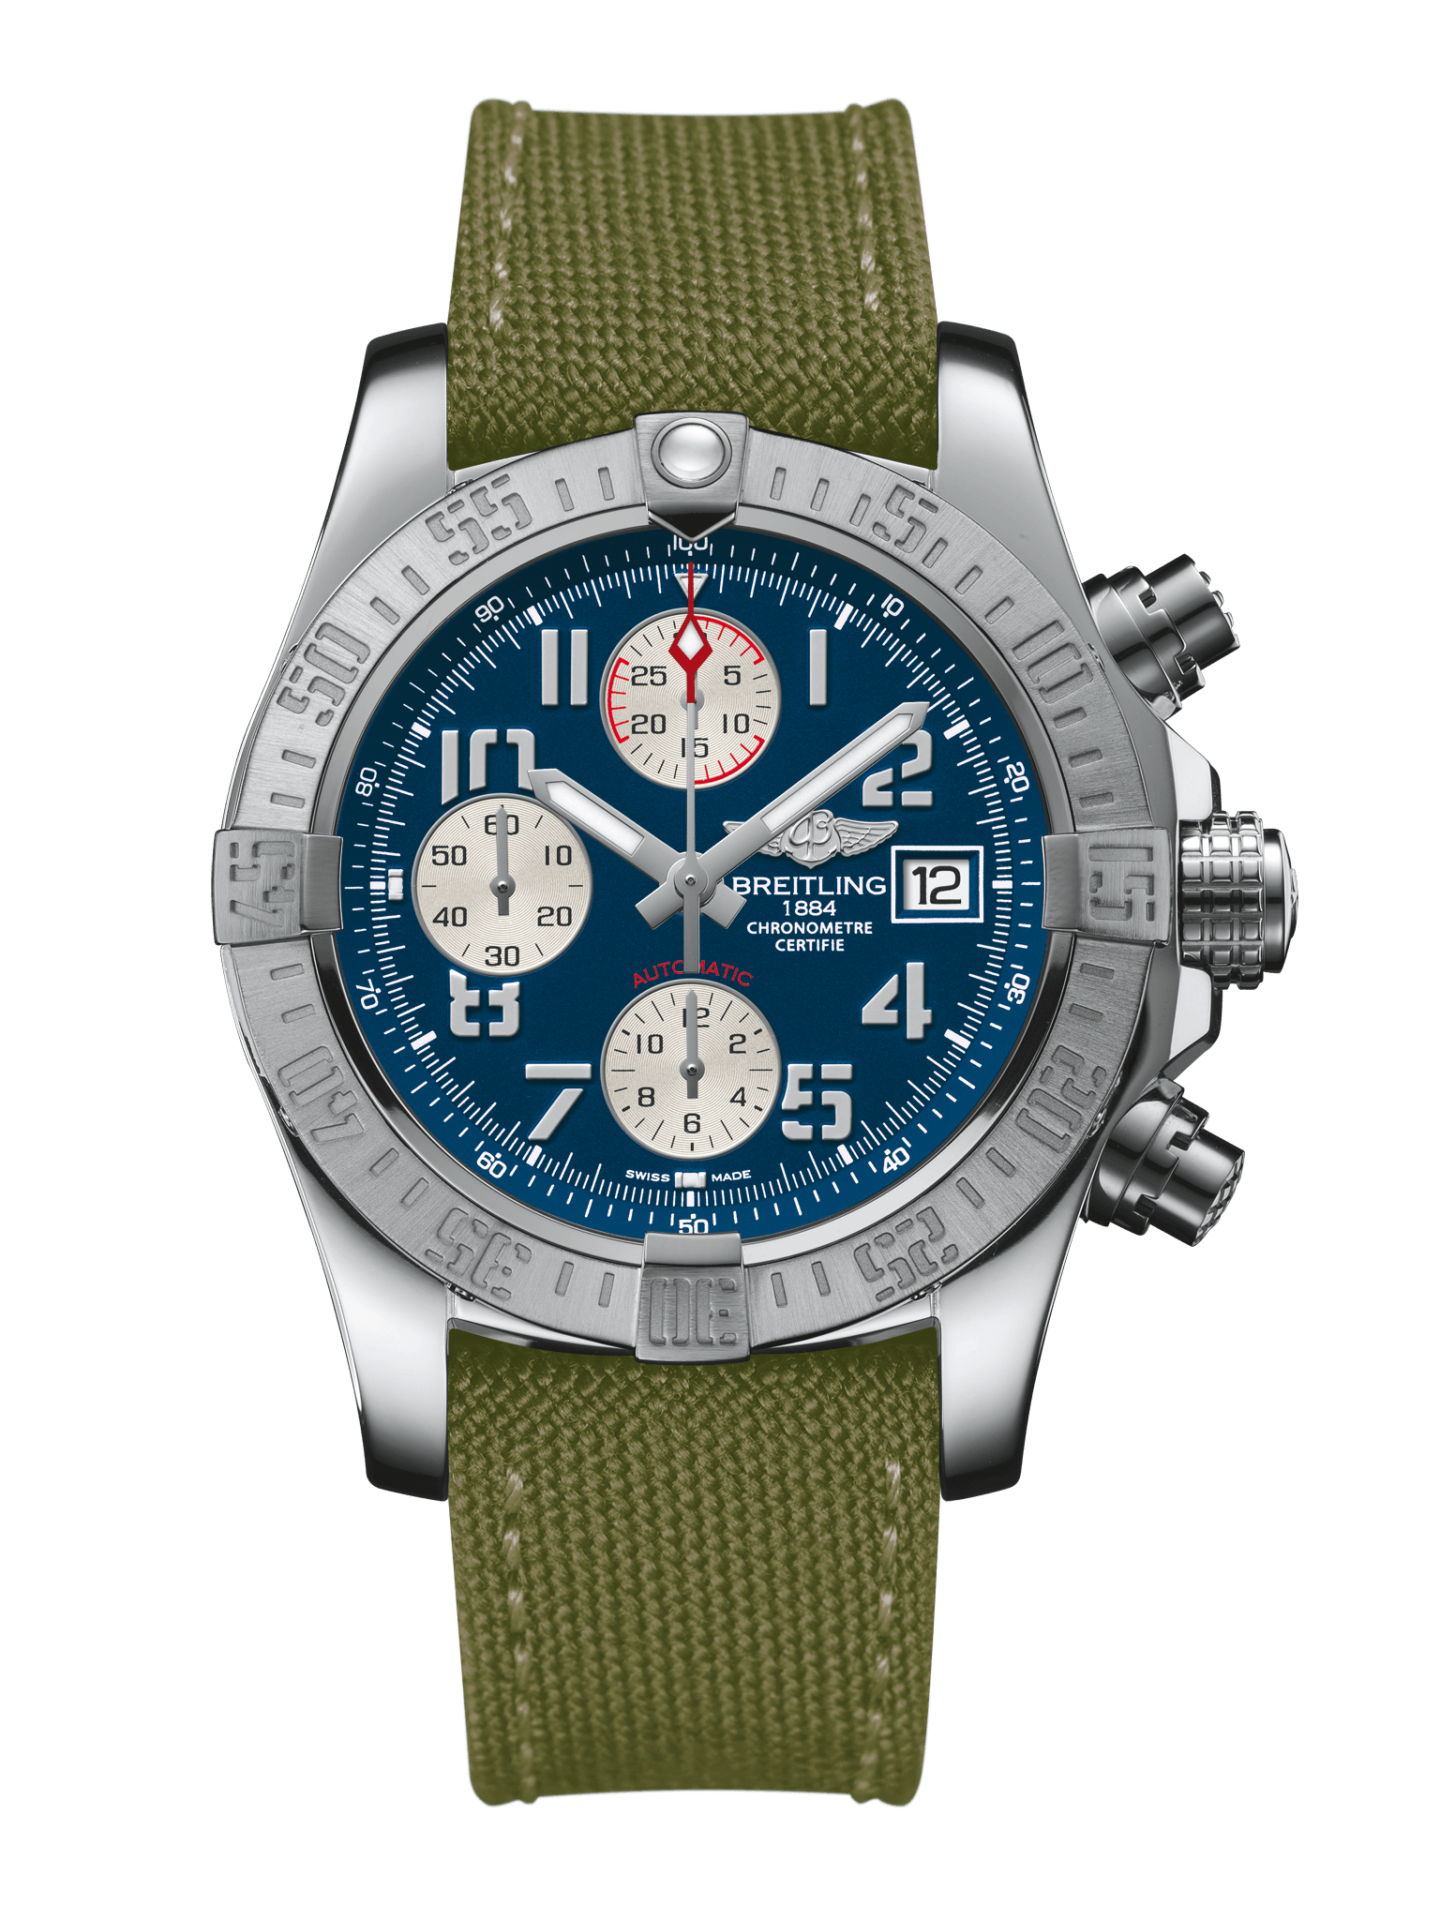 Breitling-Avenger-Avenger-II-Hall-of-Time-A1338111-C870-106W-A20BA.1